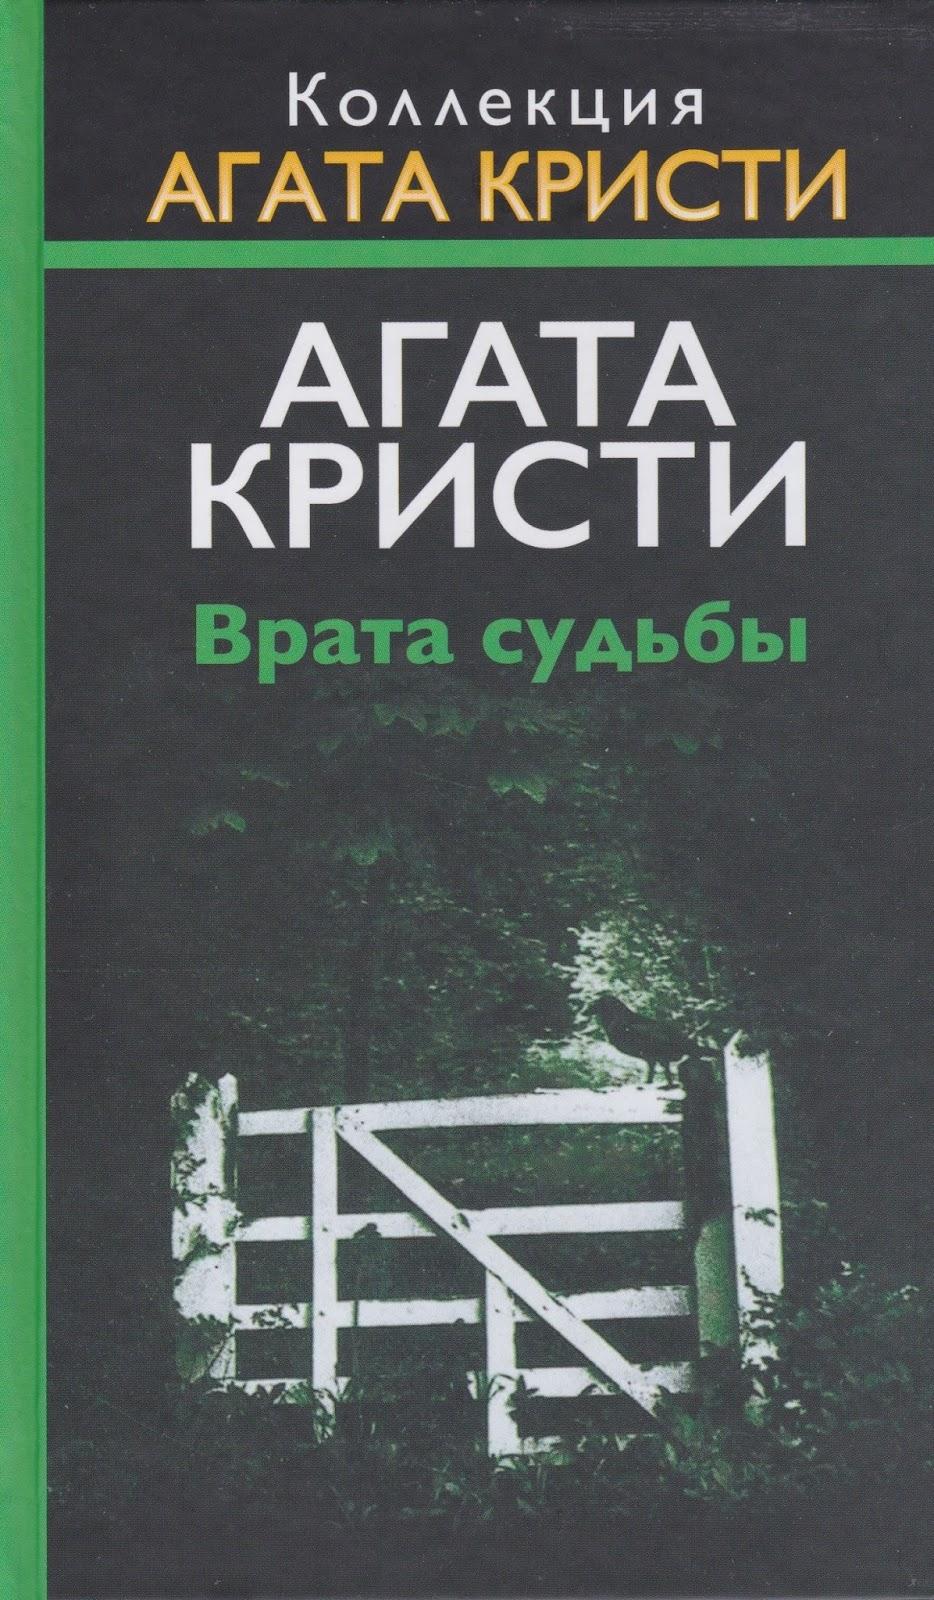 Агата Кристи — Врата Судьбы (1973)